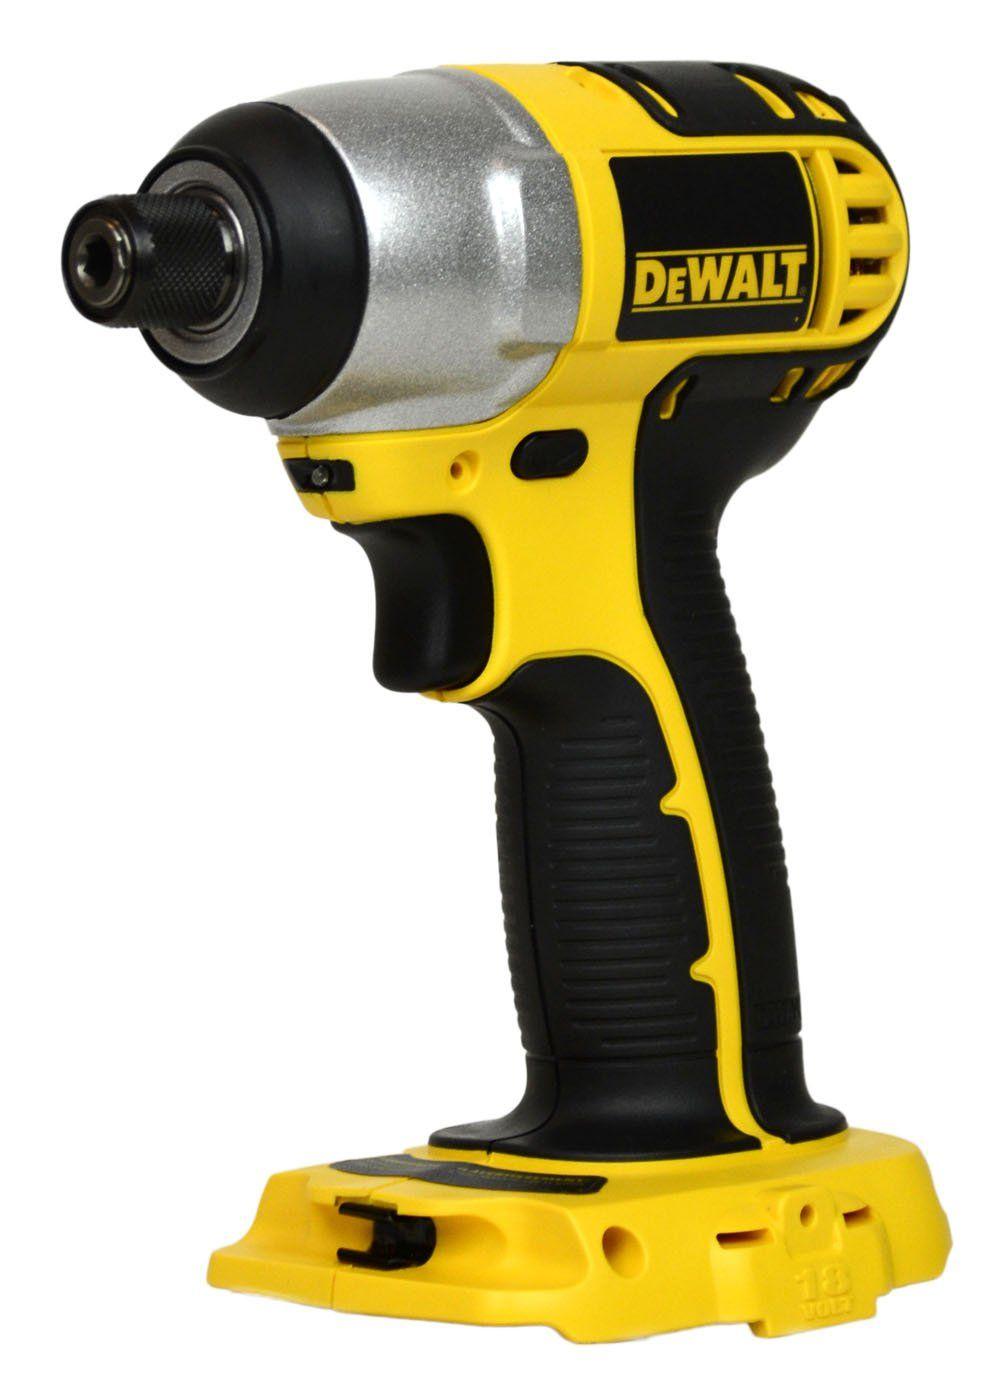 Dewalt Dc825 2 Pack 18v 1 4 Hex Cordless Impact Driver New Bare